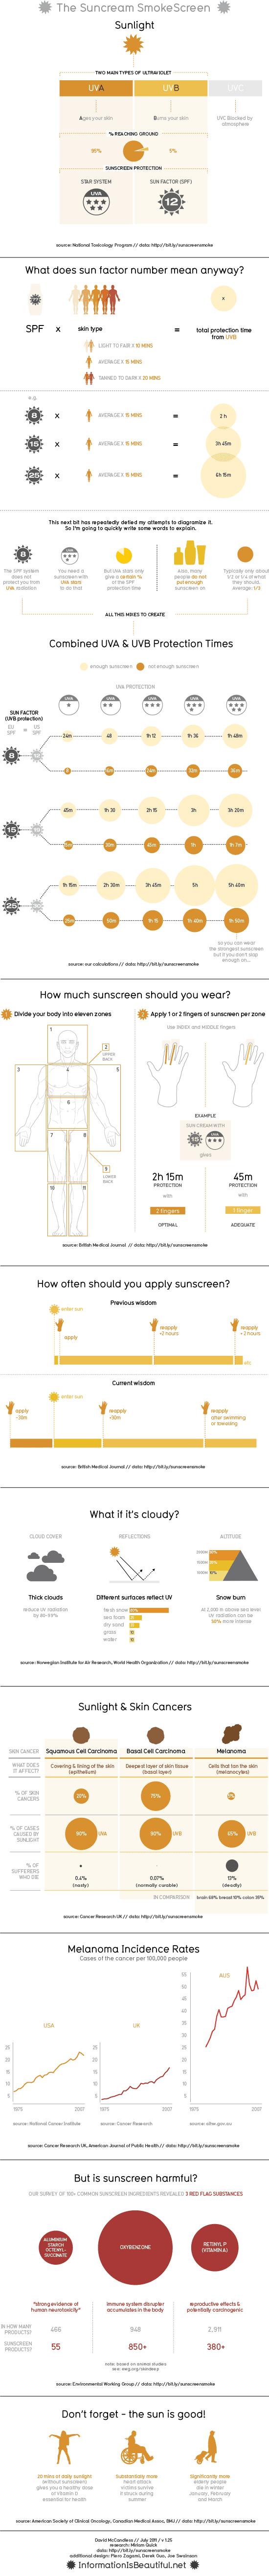 Suncream info